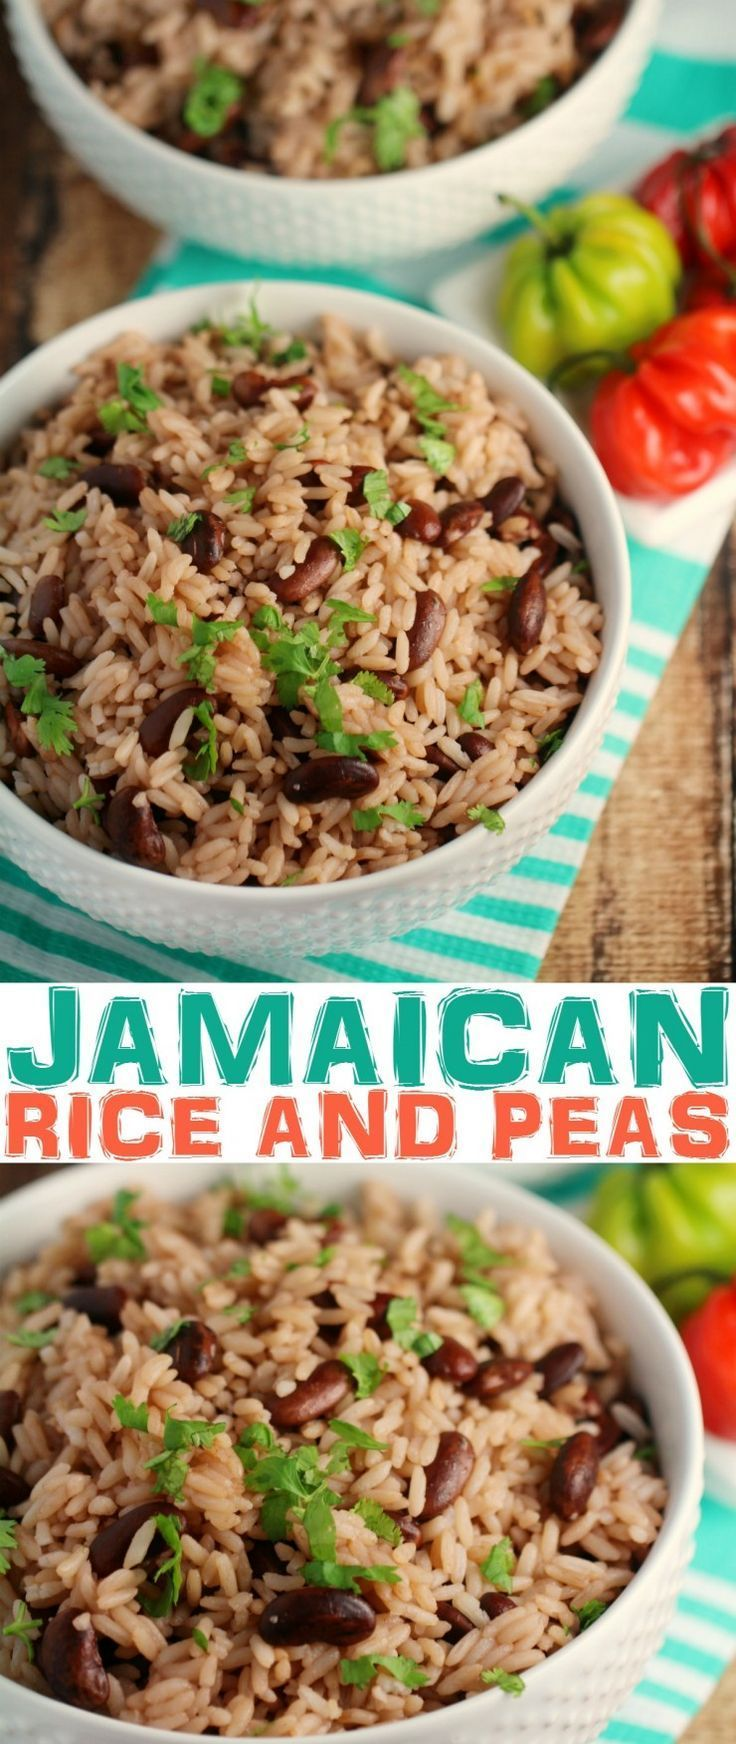 Jamaican food Jamaican recipes, Jamaican restaurant, Dinner